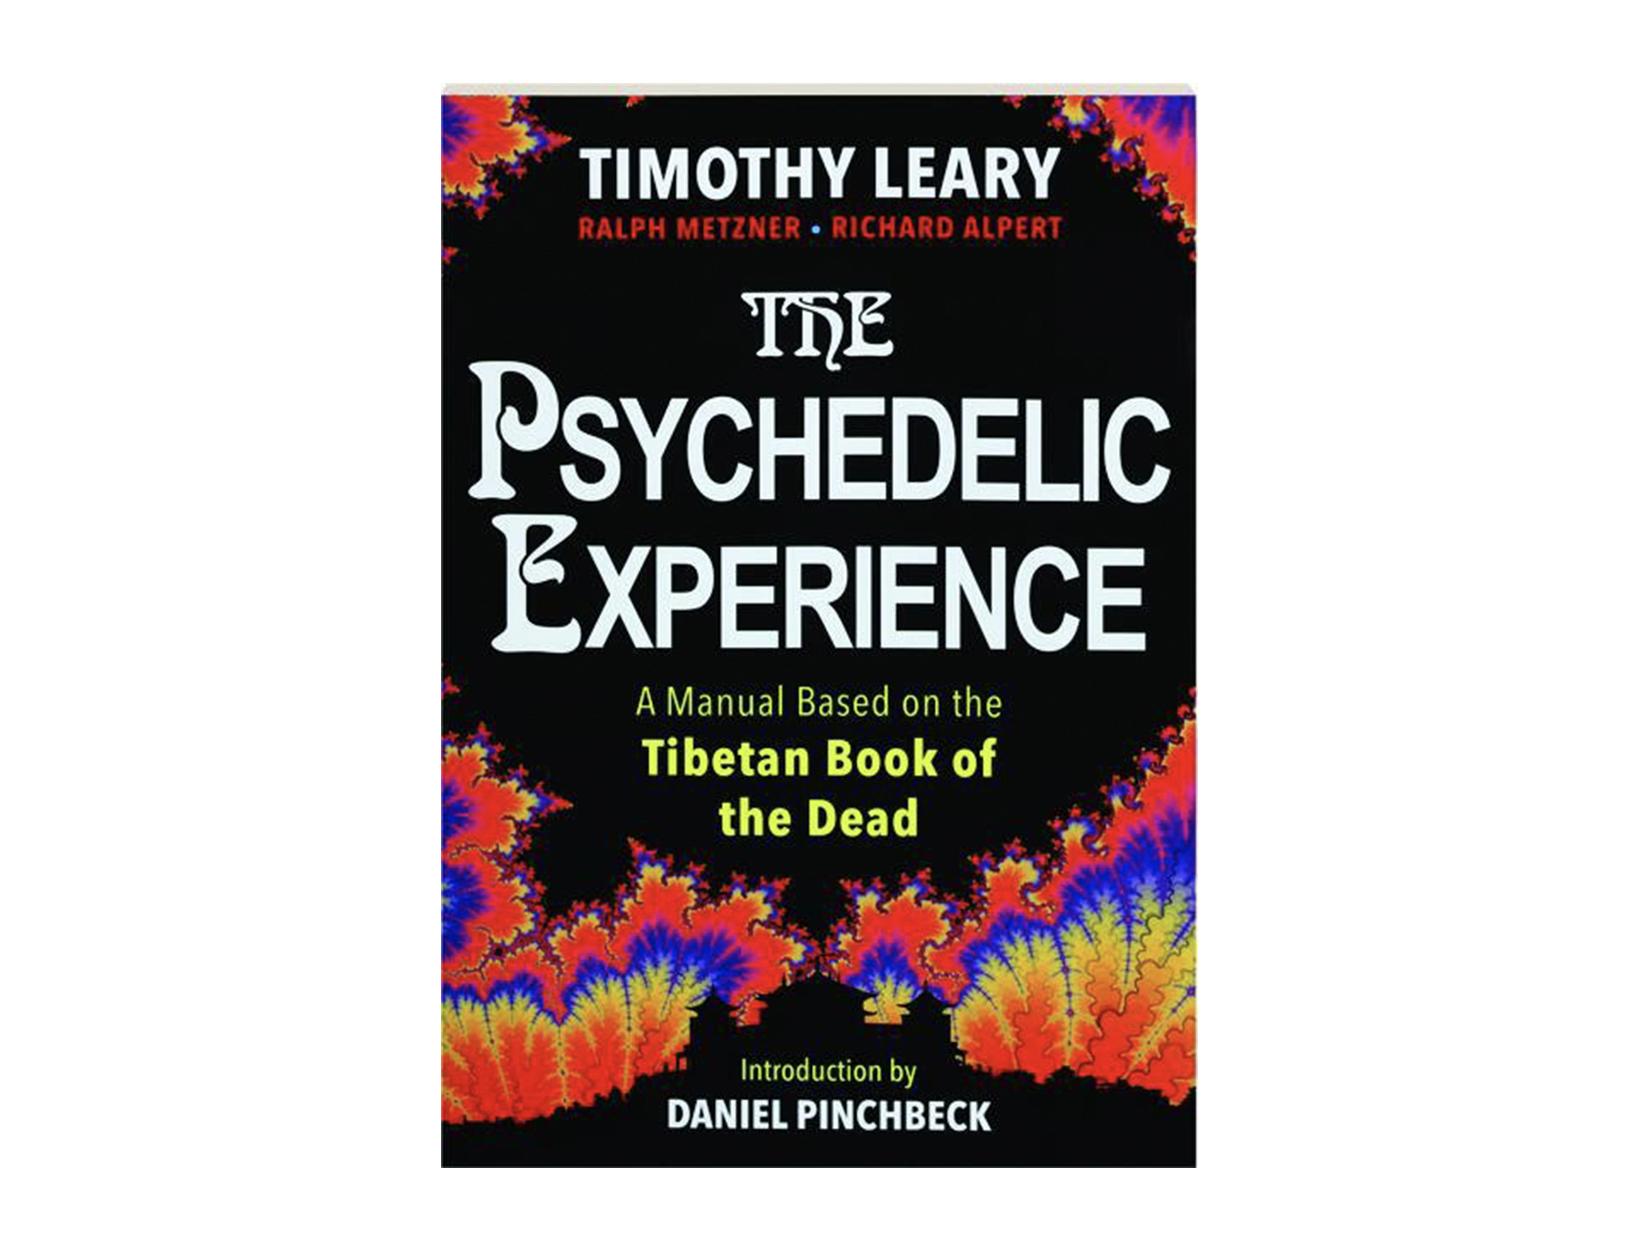 <em>Timothy Leary, Ralph Metzner ve Richard Alpert